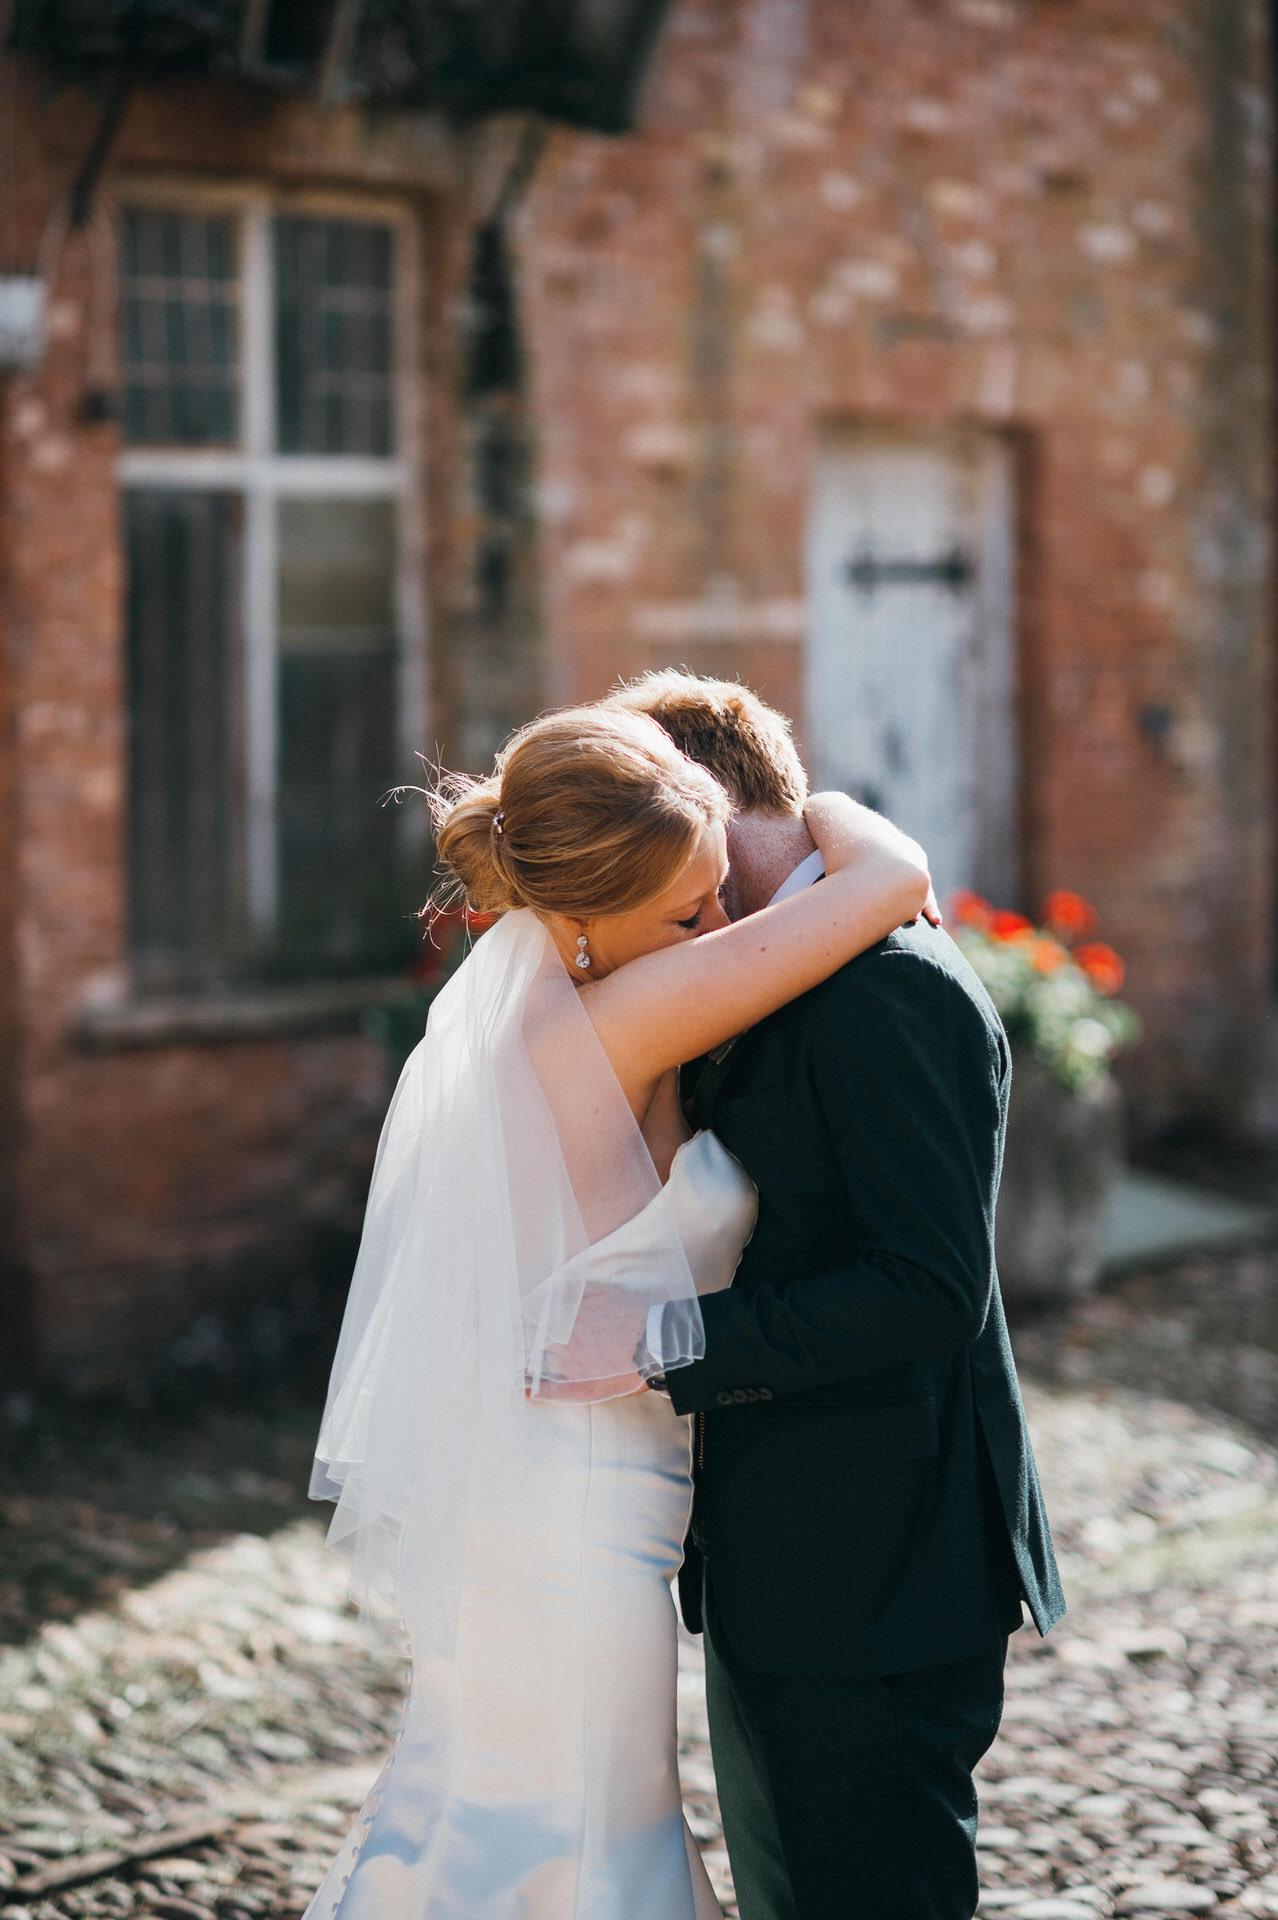 Maunsel house wedding photography 36 wedding portrait